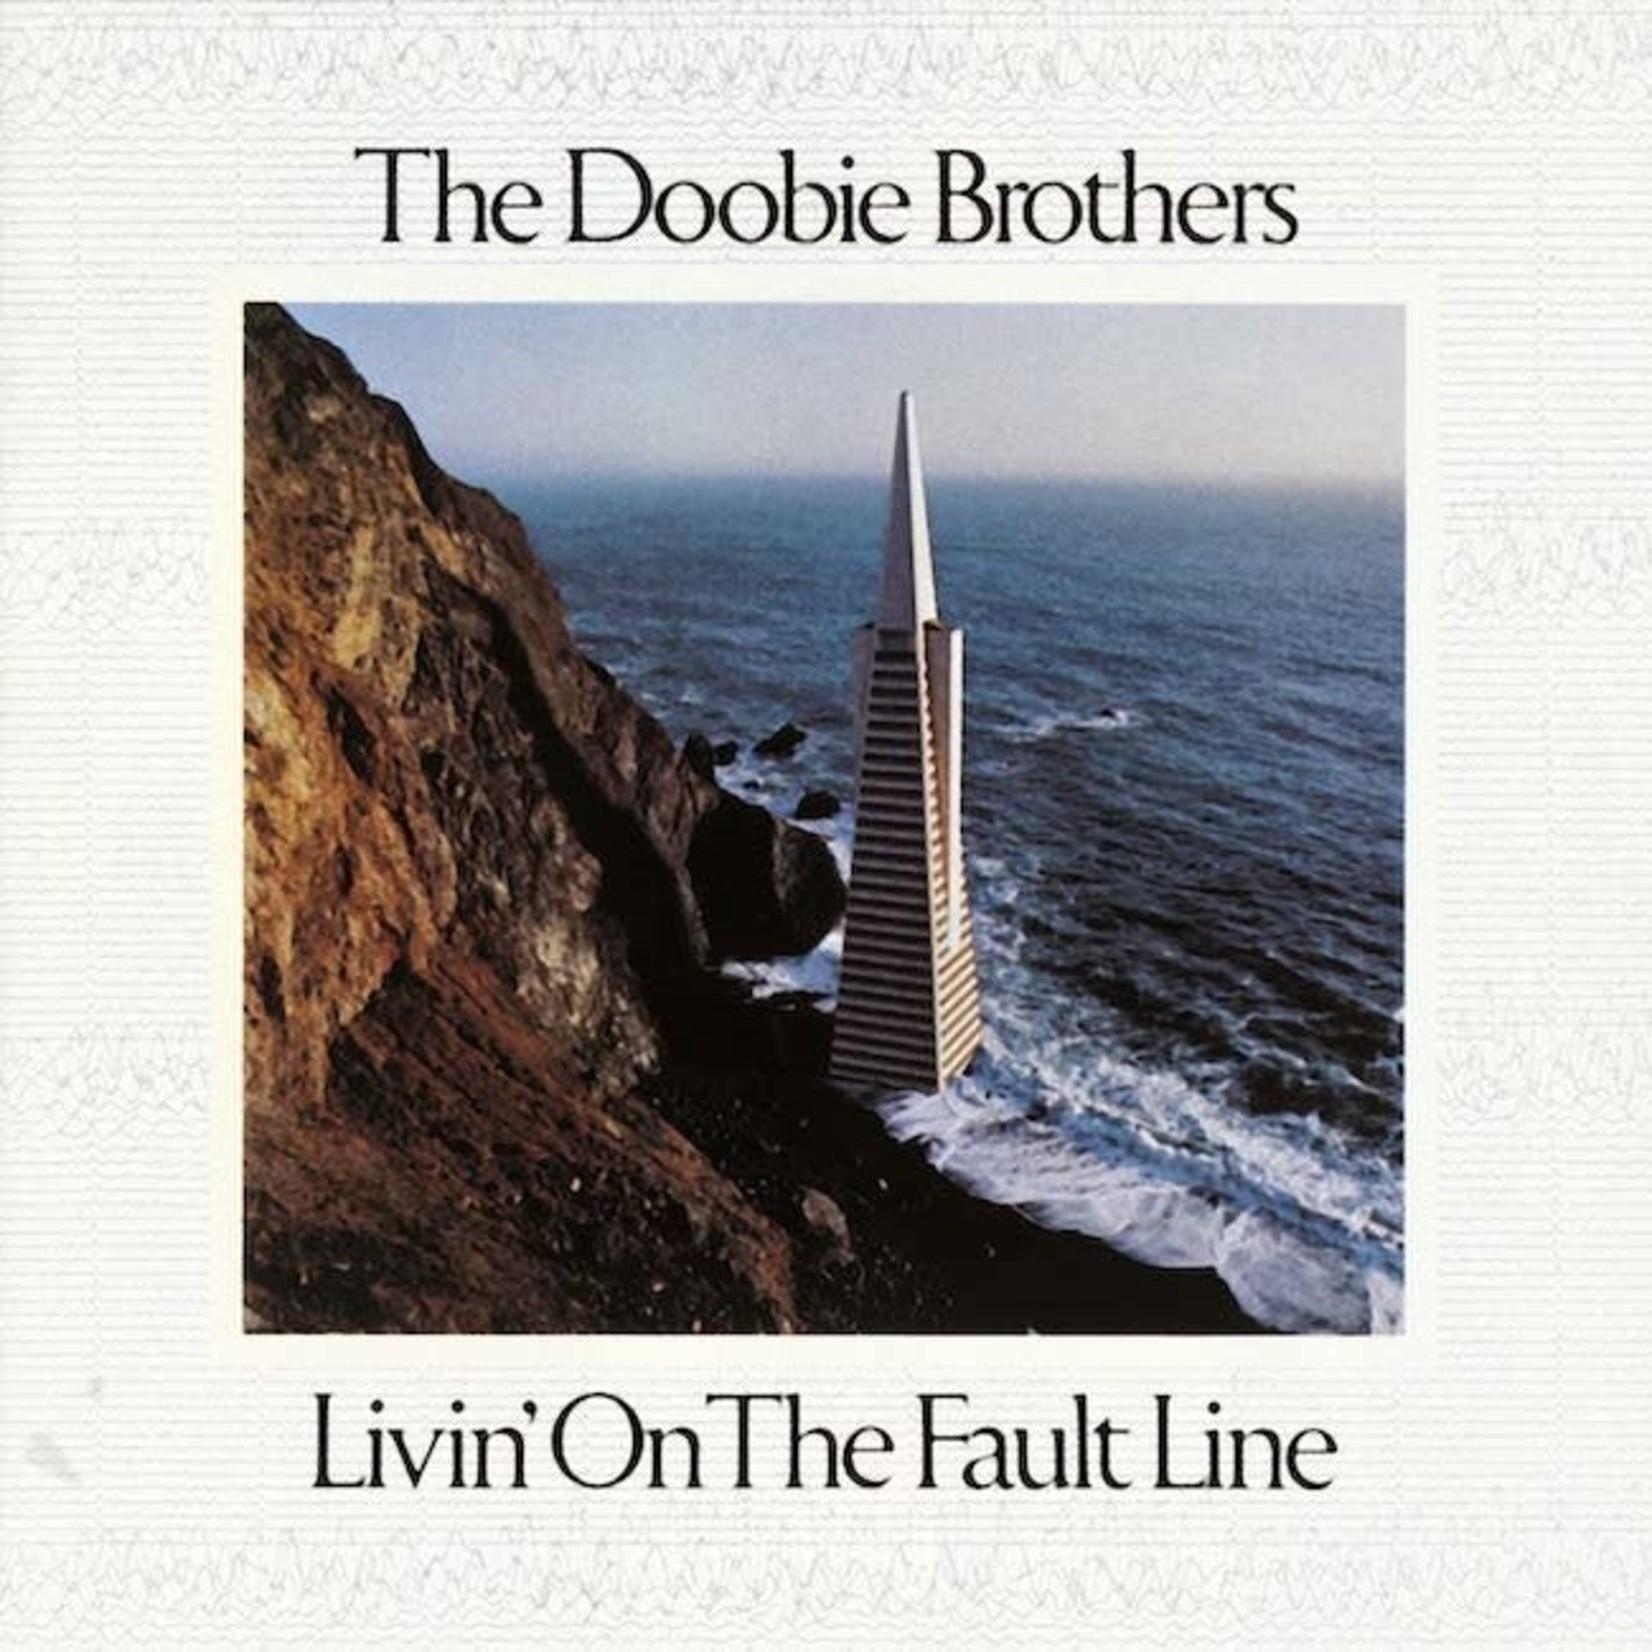 [Vintage] Doobie Brothers: Livin' on the Fault Line